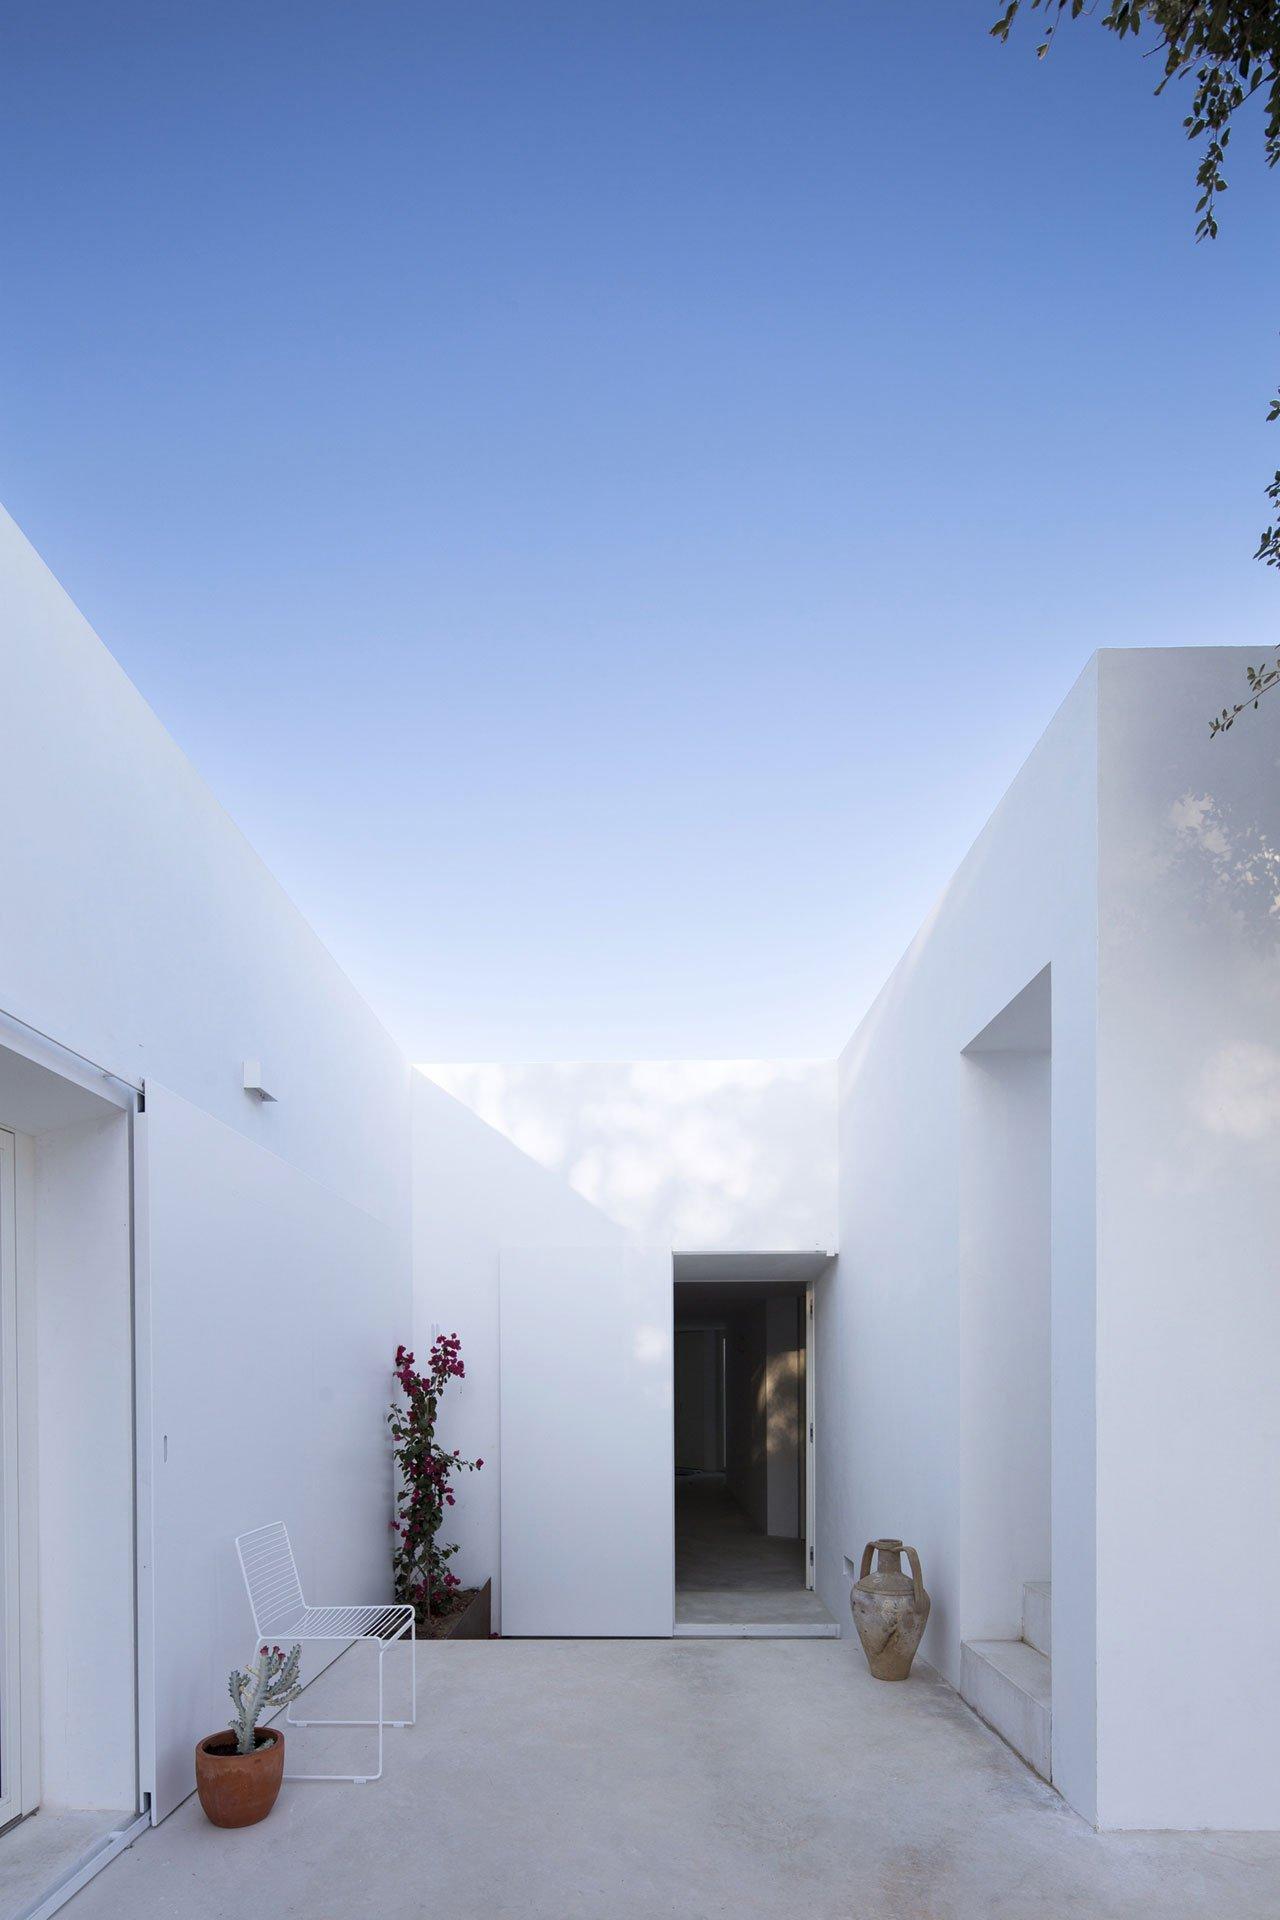 casa-luum-minimalizmus-a-portugal-videken-noko-014.jpg